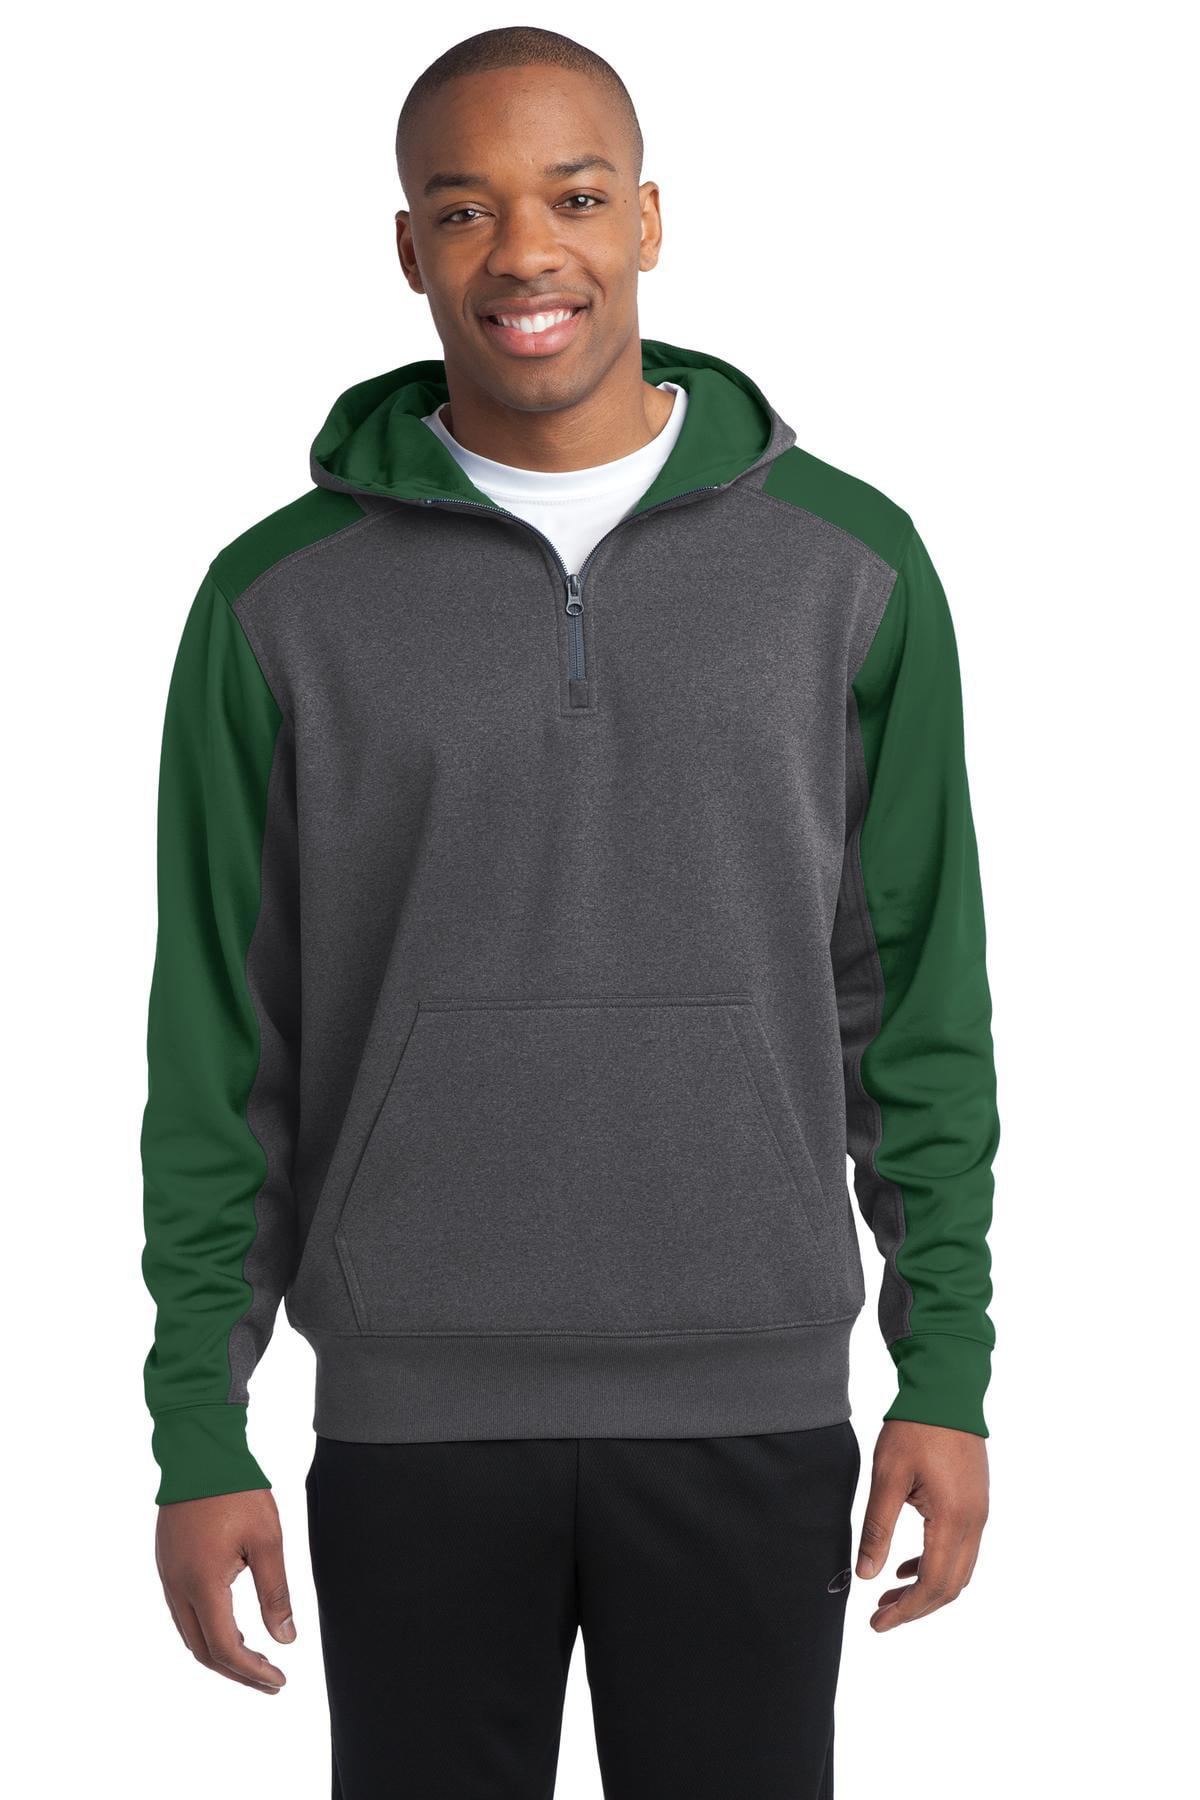 e39ec343afd Sport-Tek® Tech Fleece Colorblock 1 4-Zip Hooded Sweatshirt. St249 ...